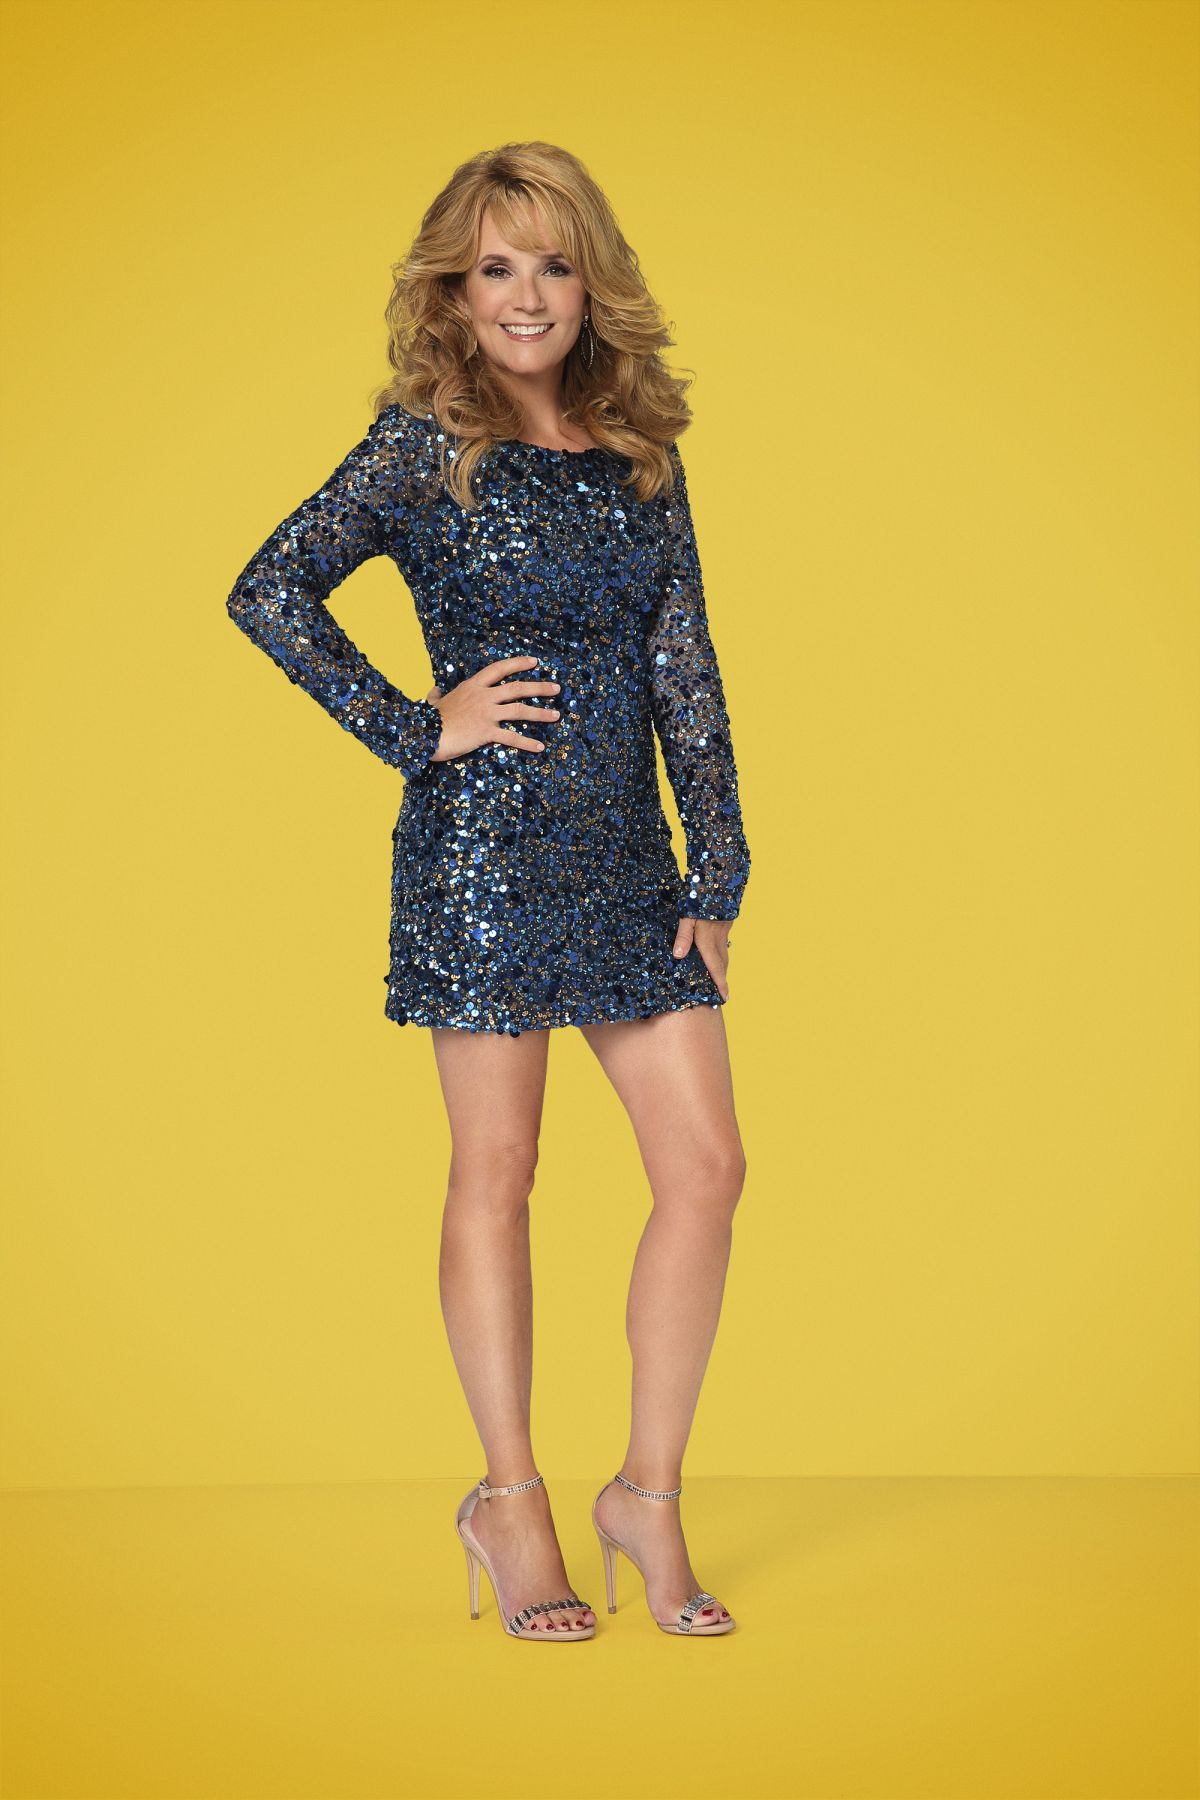 LEA THOMPSON - Dancing With the Stars, Season 19 Promos